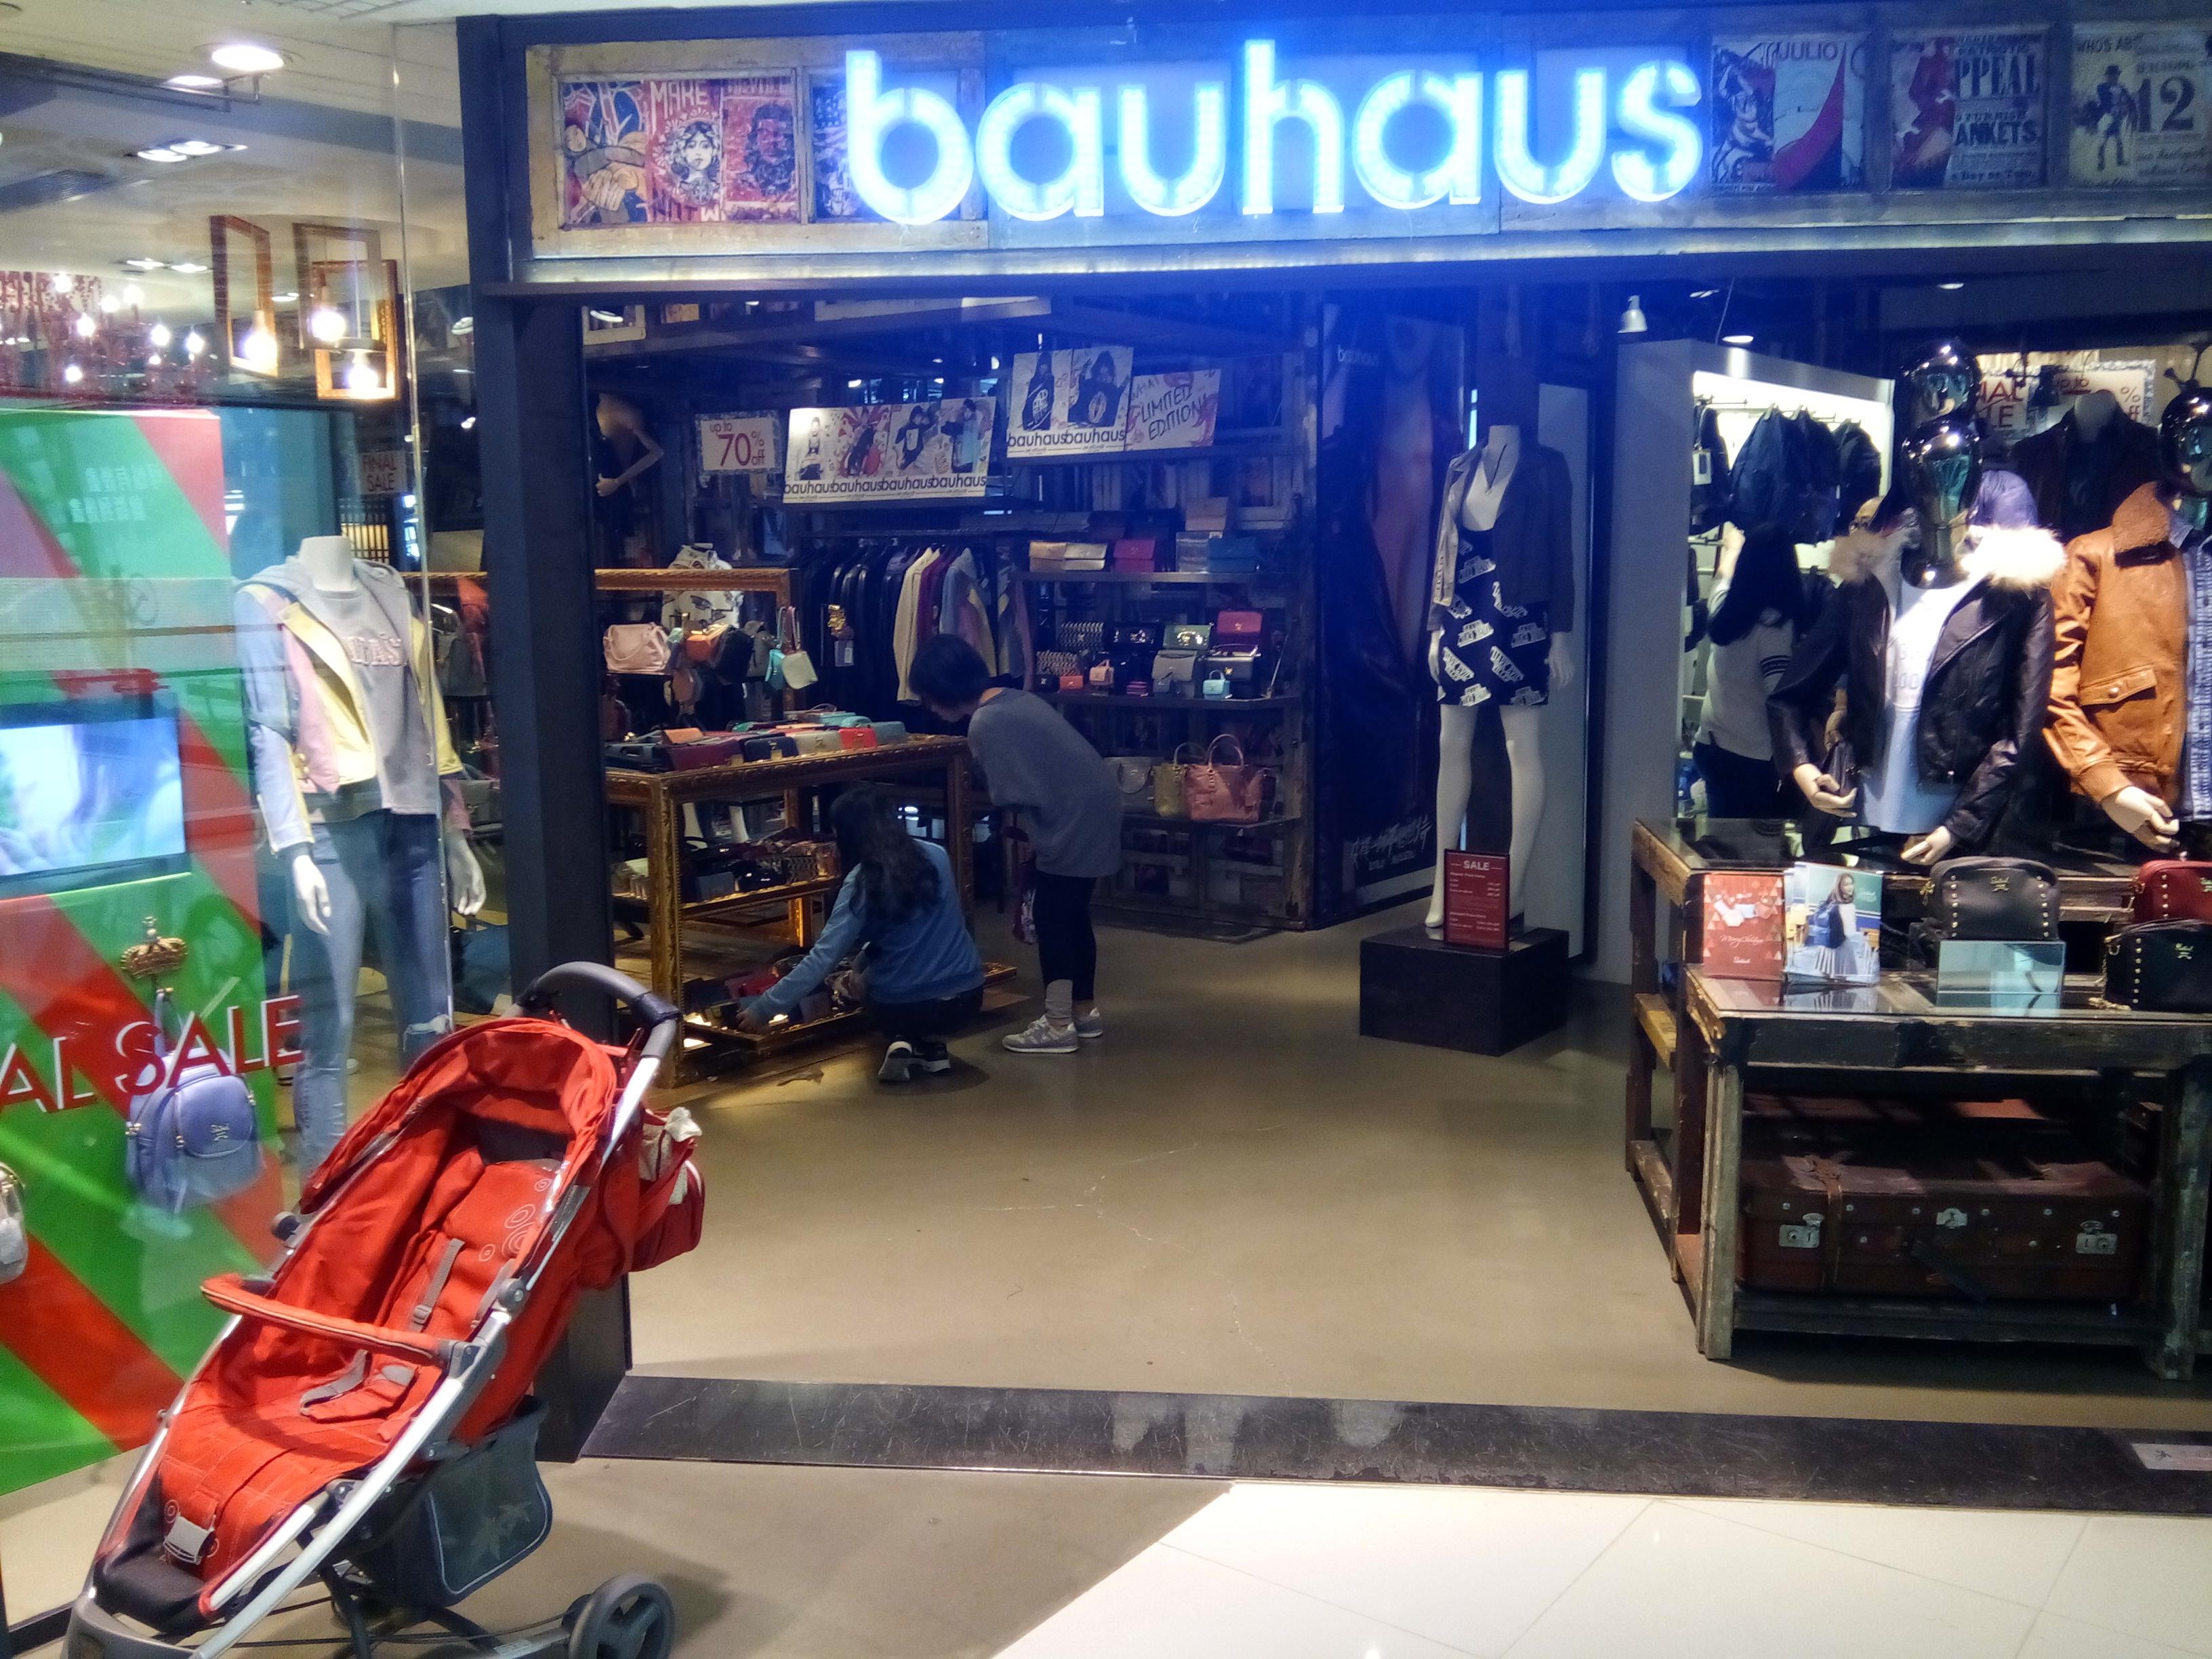 Filehk Sheung Shui 上水廣場 Landmark North Shop Bauhaus Clothing